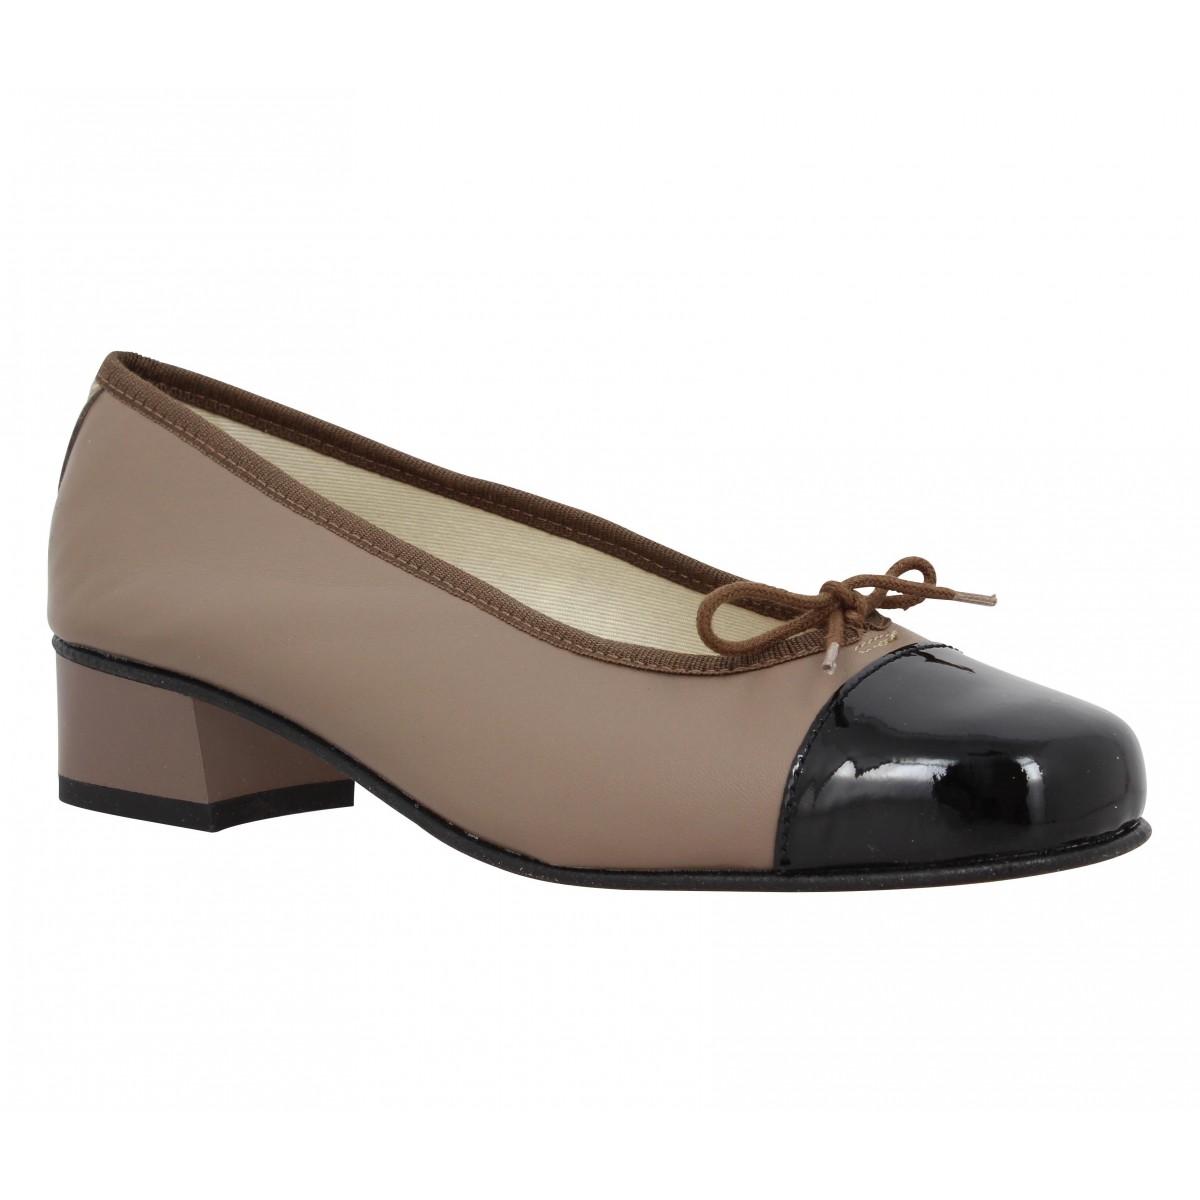 Ballerines HIRICA Orly cuir + vernis Femme Taupe + Noir